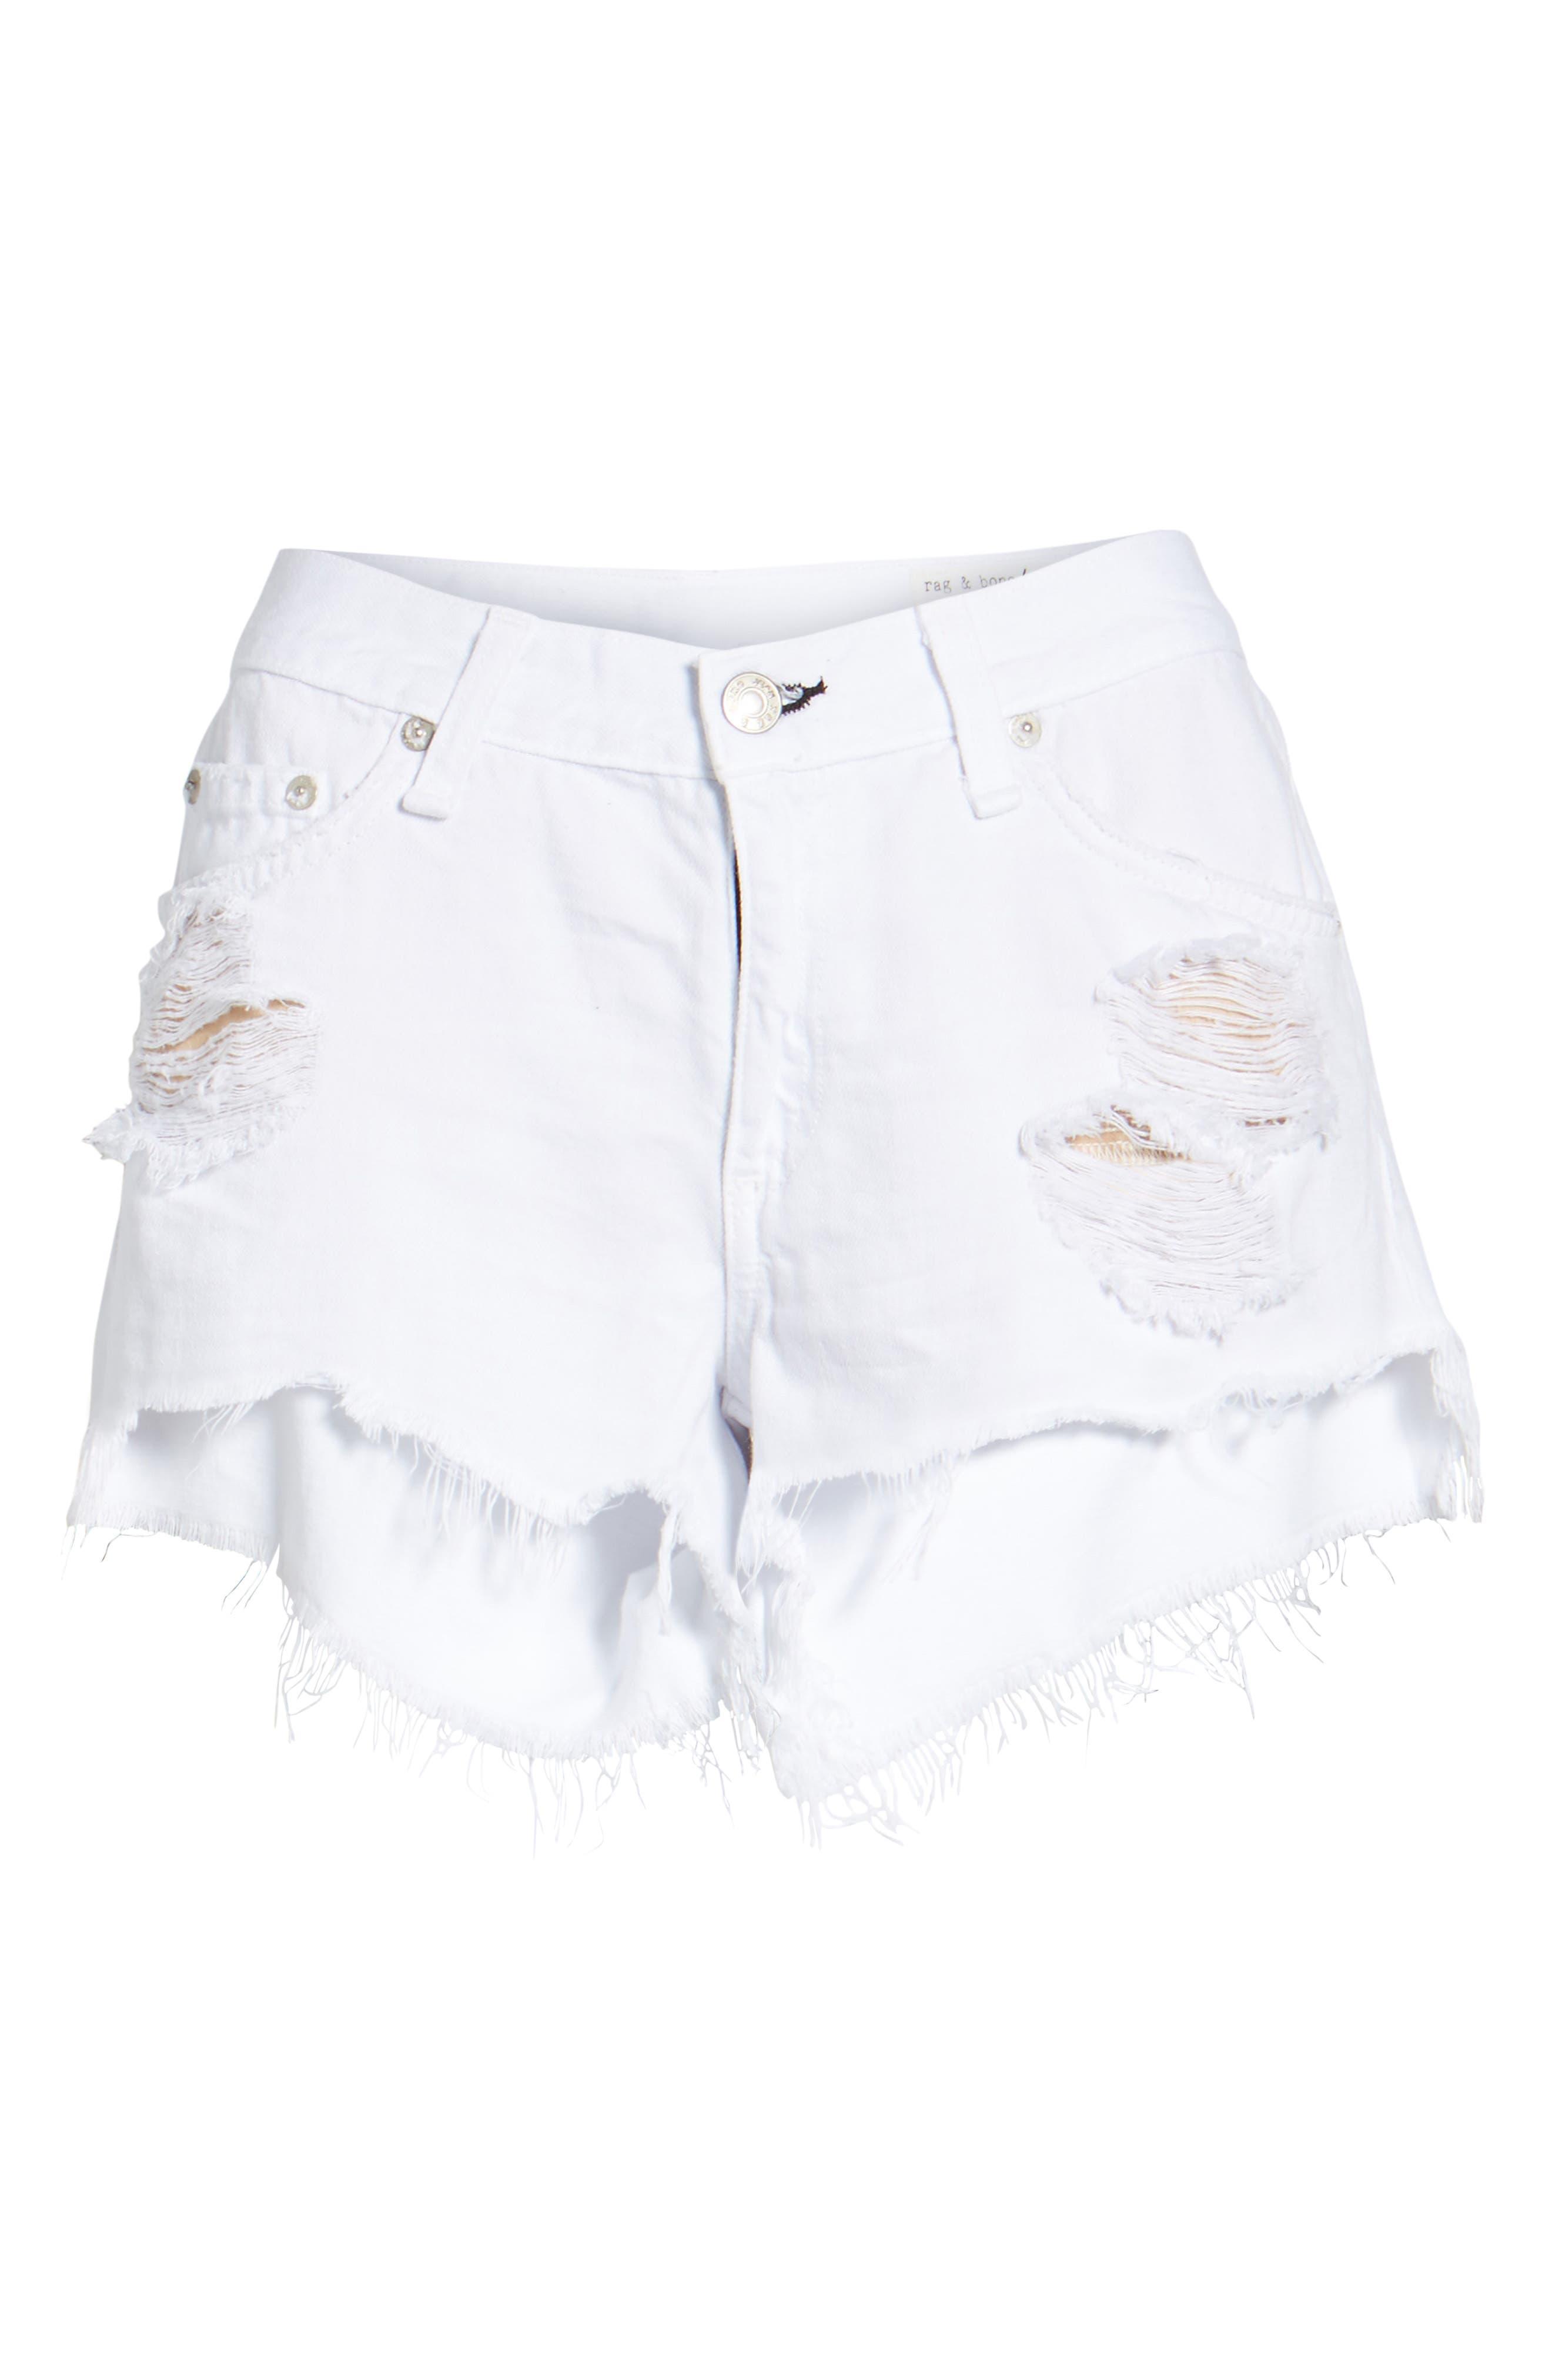 Ripped Cutoff Denim Shorts,                             Alternate thumbnail 4, color,